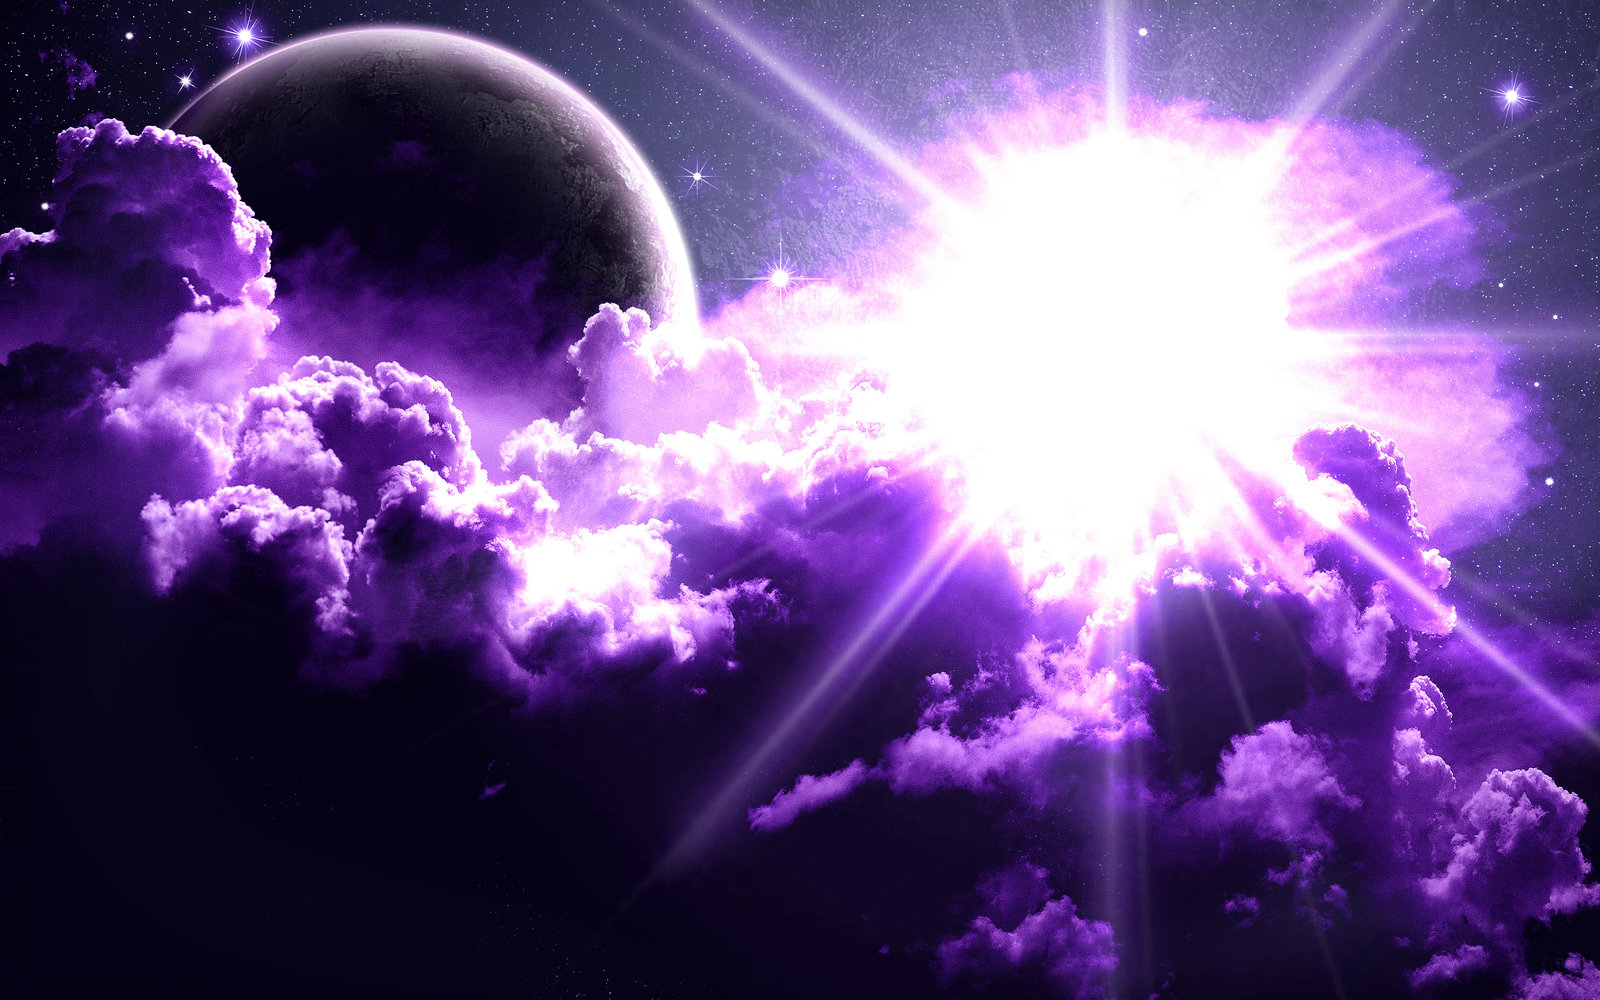 Cool Purple Backgrounds hd HD wallpaper background 1600x1000